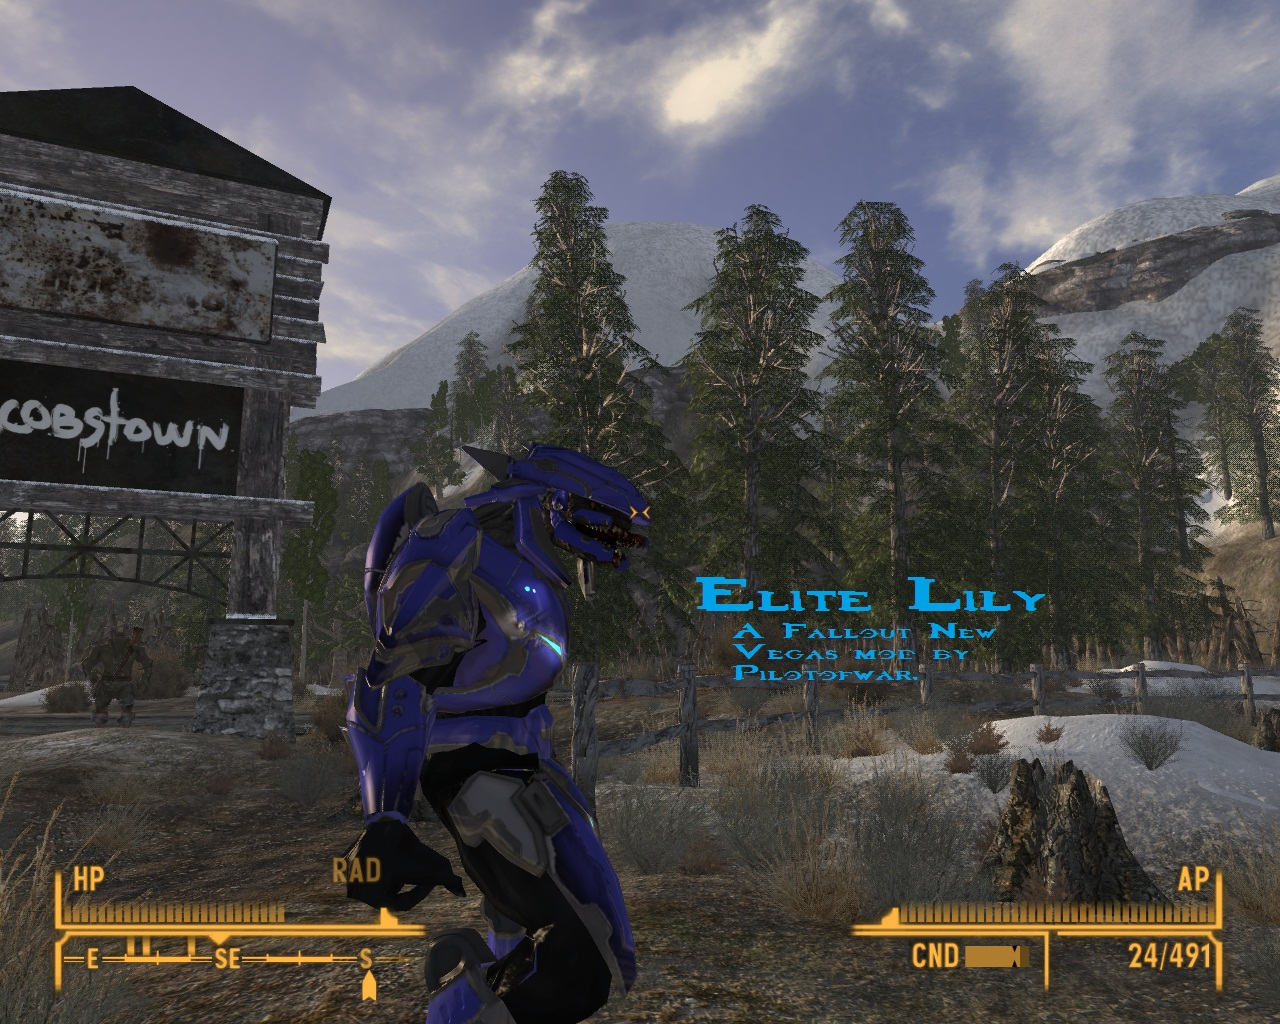 Elite Lily mod for Fallout: New Vegas - Mod DB